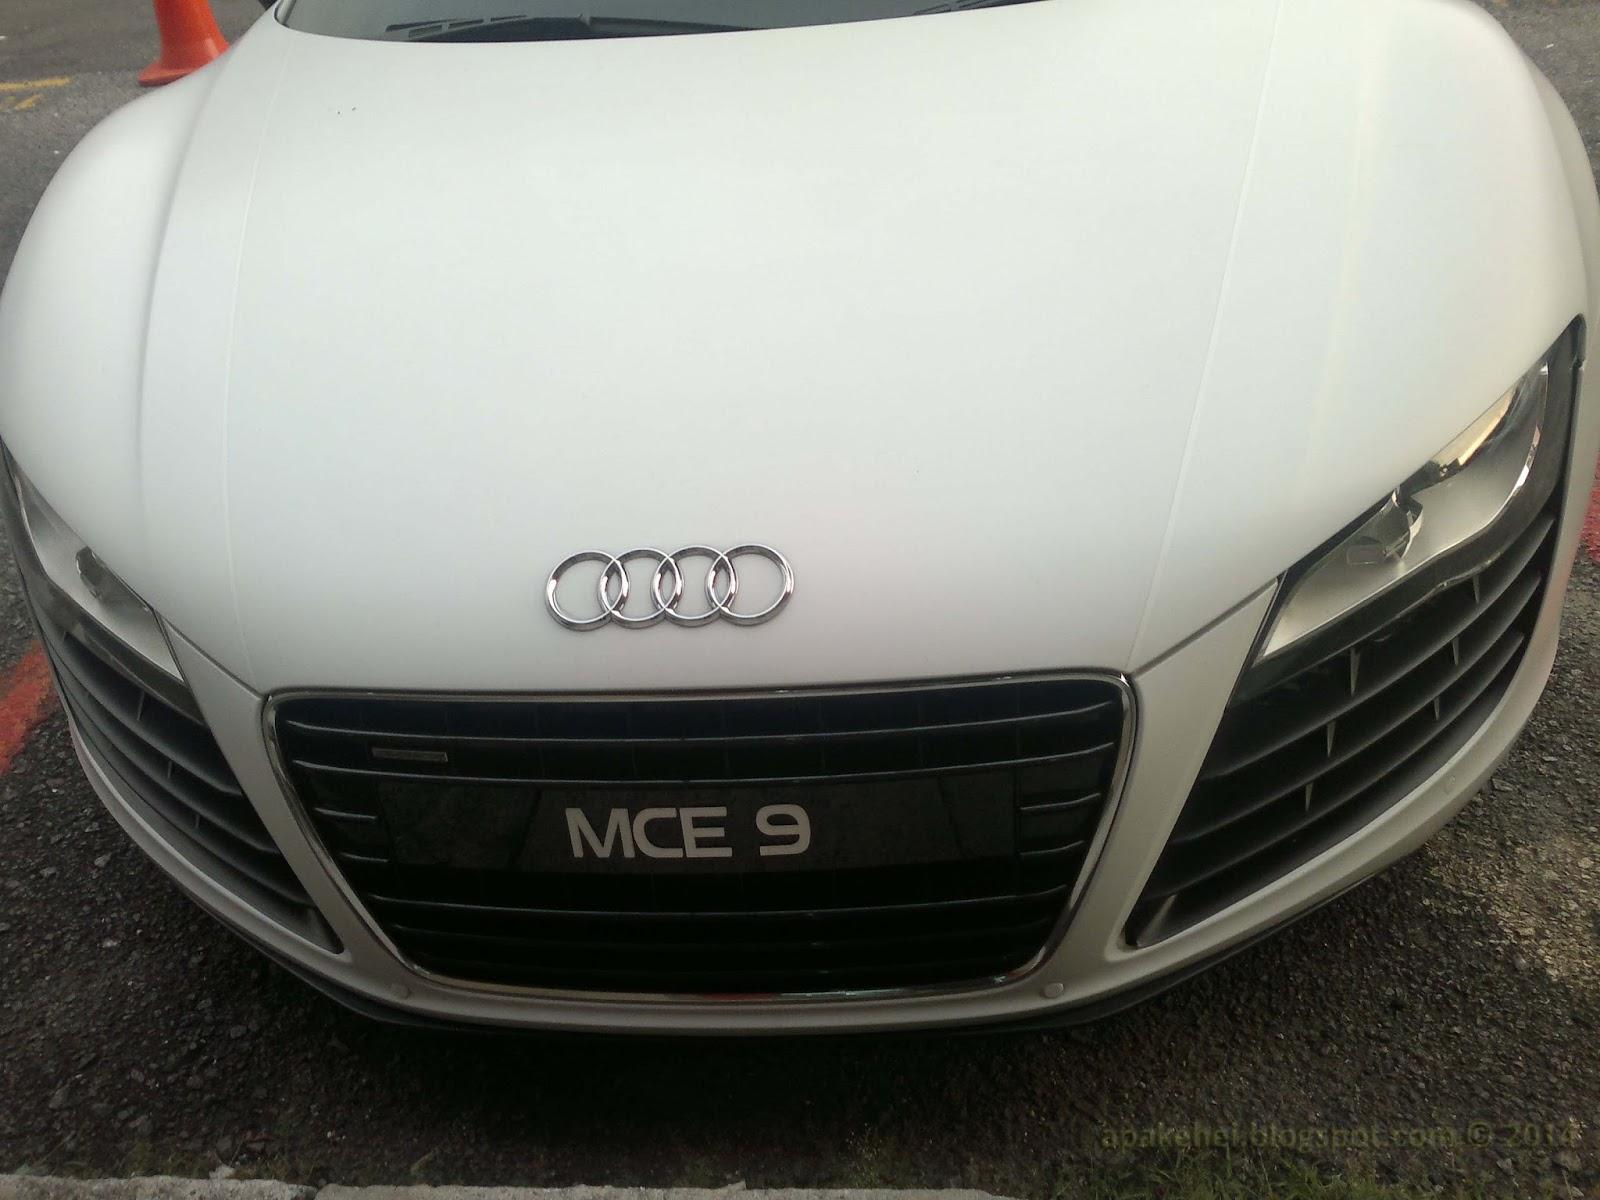 MCE 9